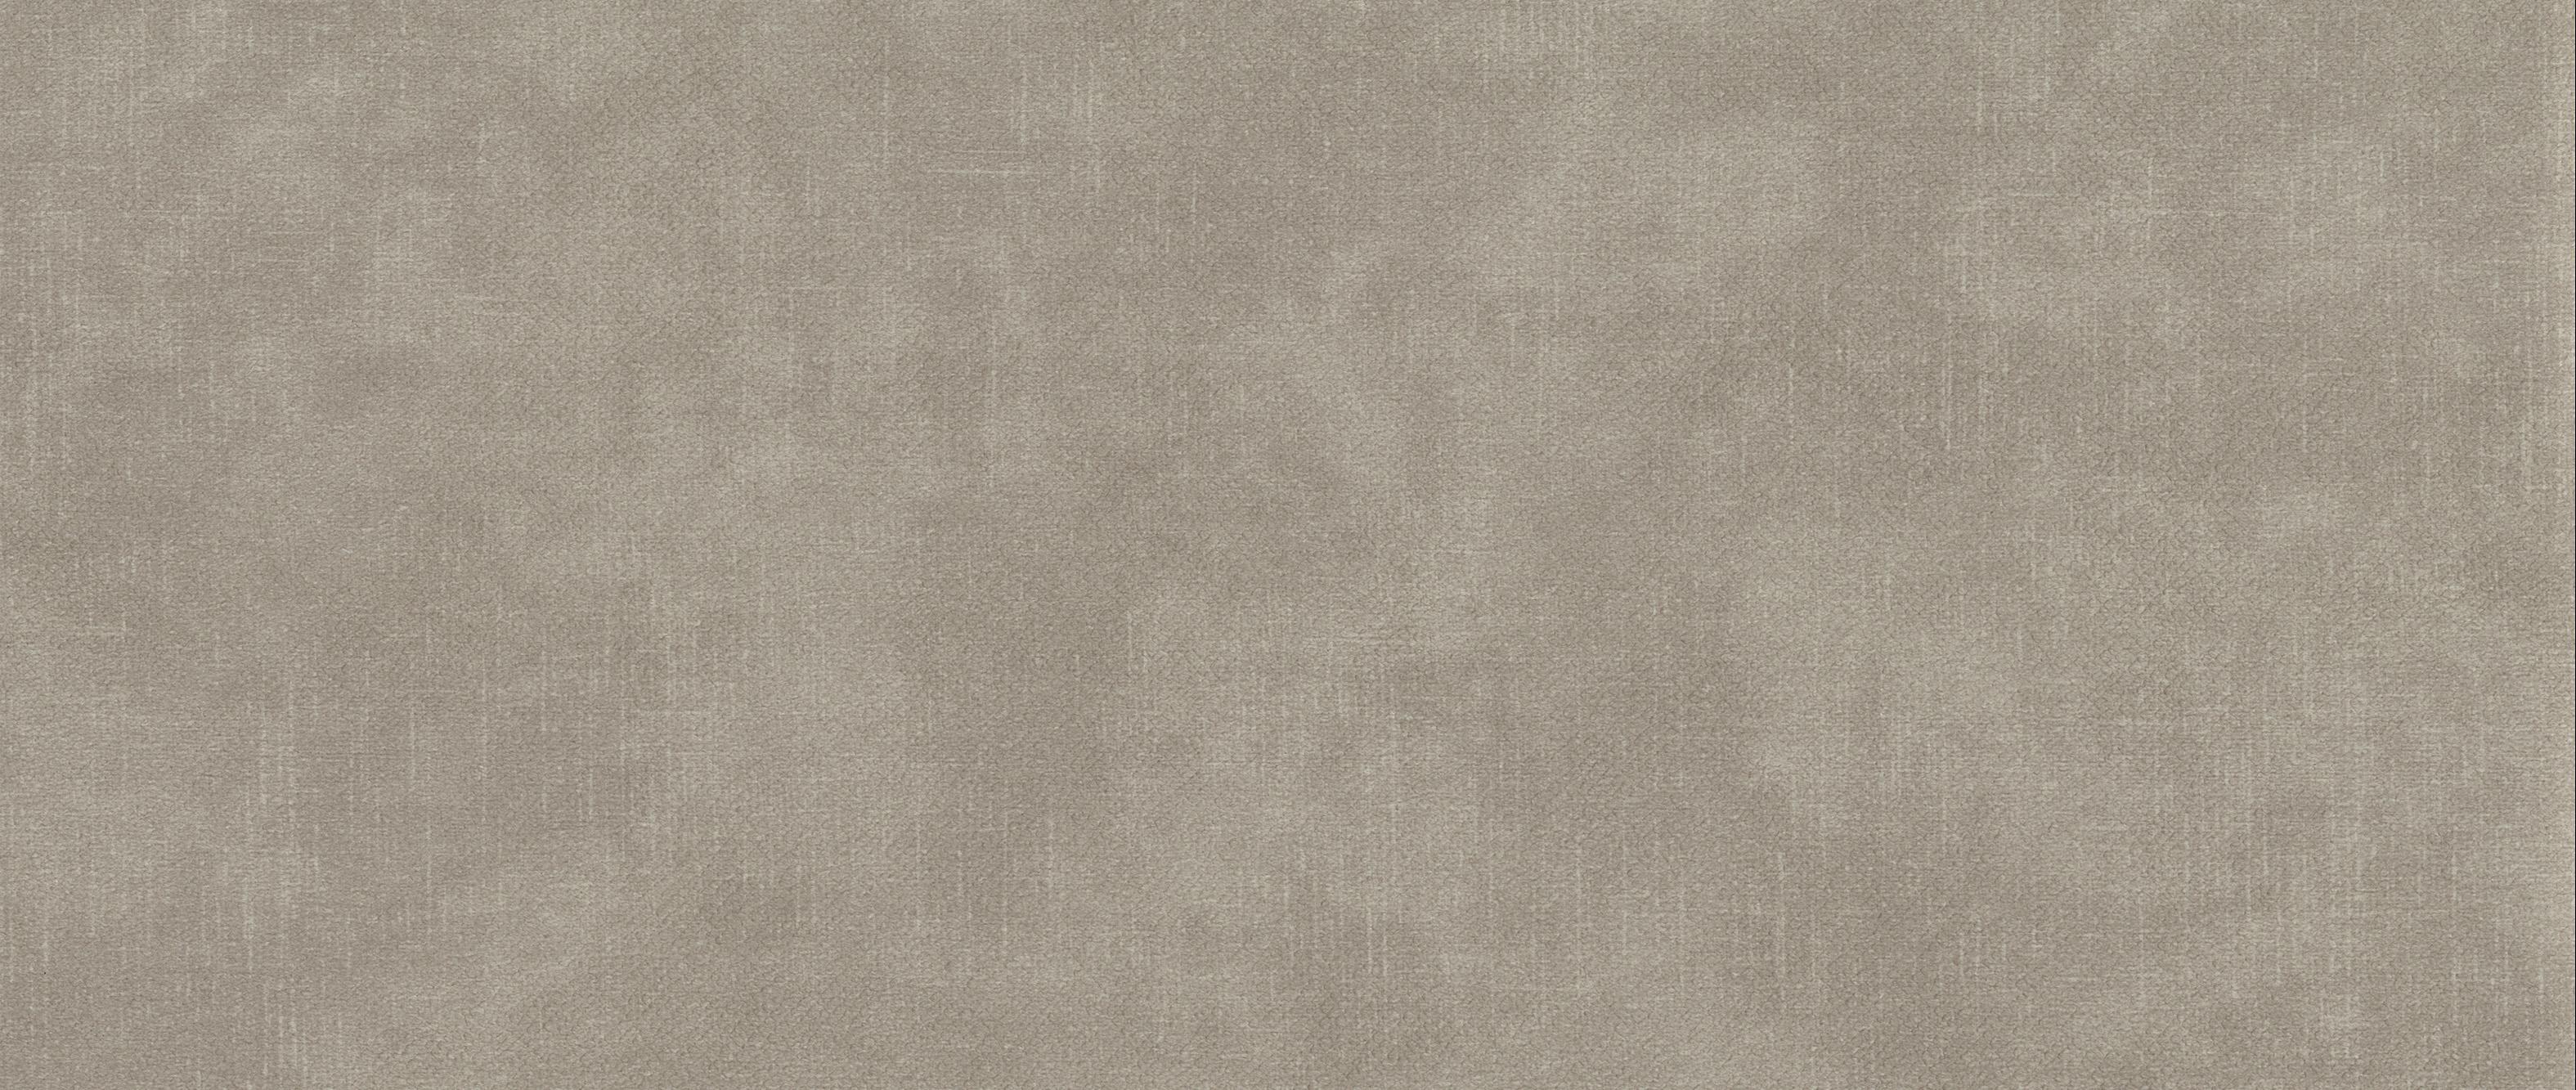 Kolor skóry: terra 13 plaskie